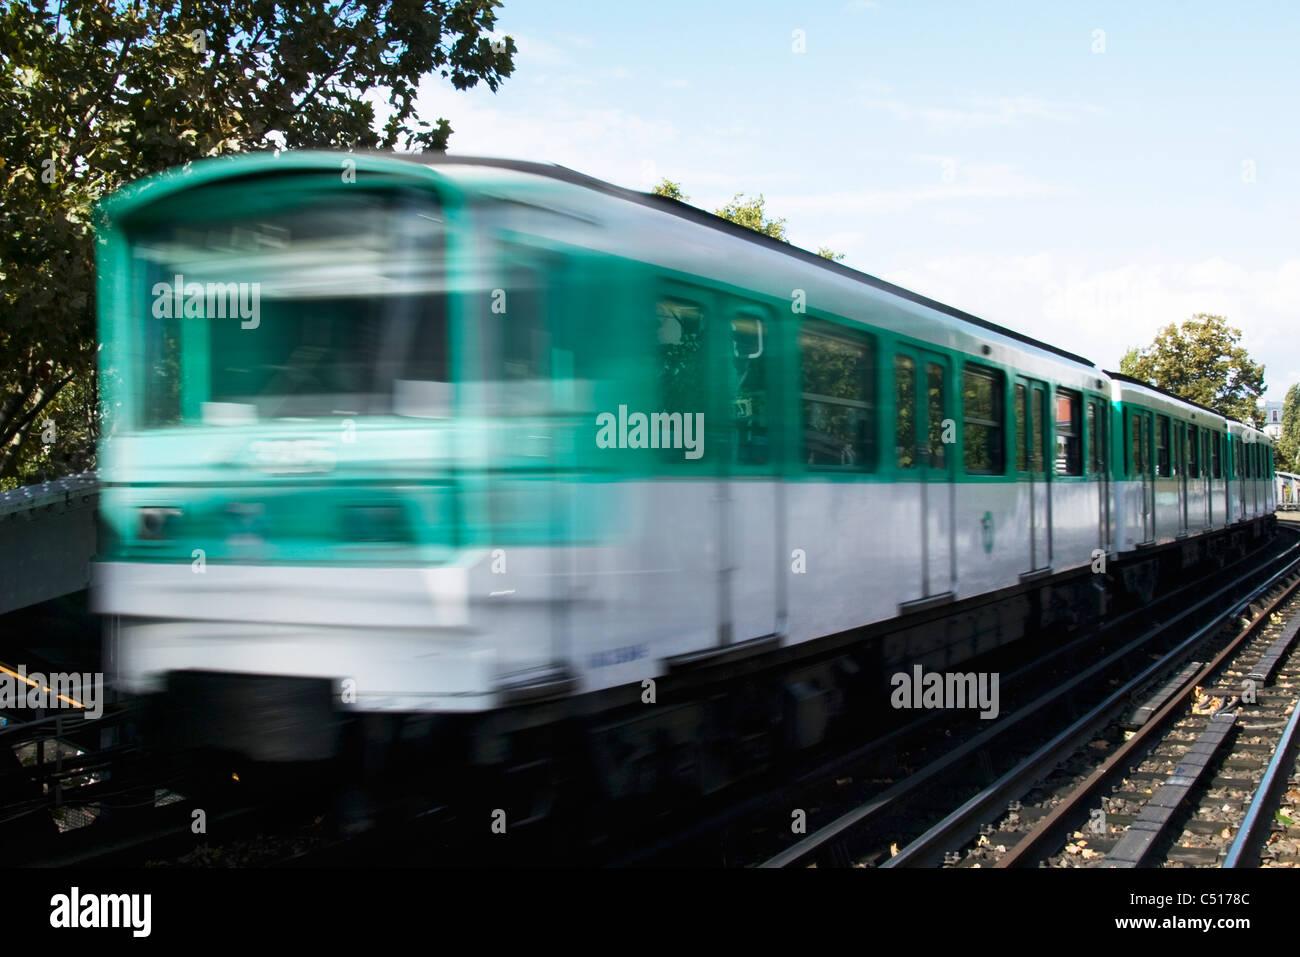 Train running on rail track - Stock Image